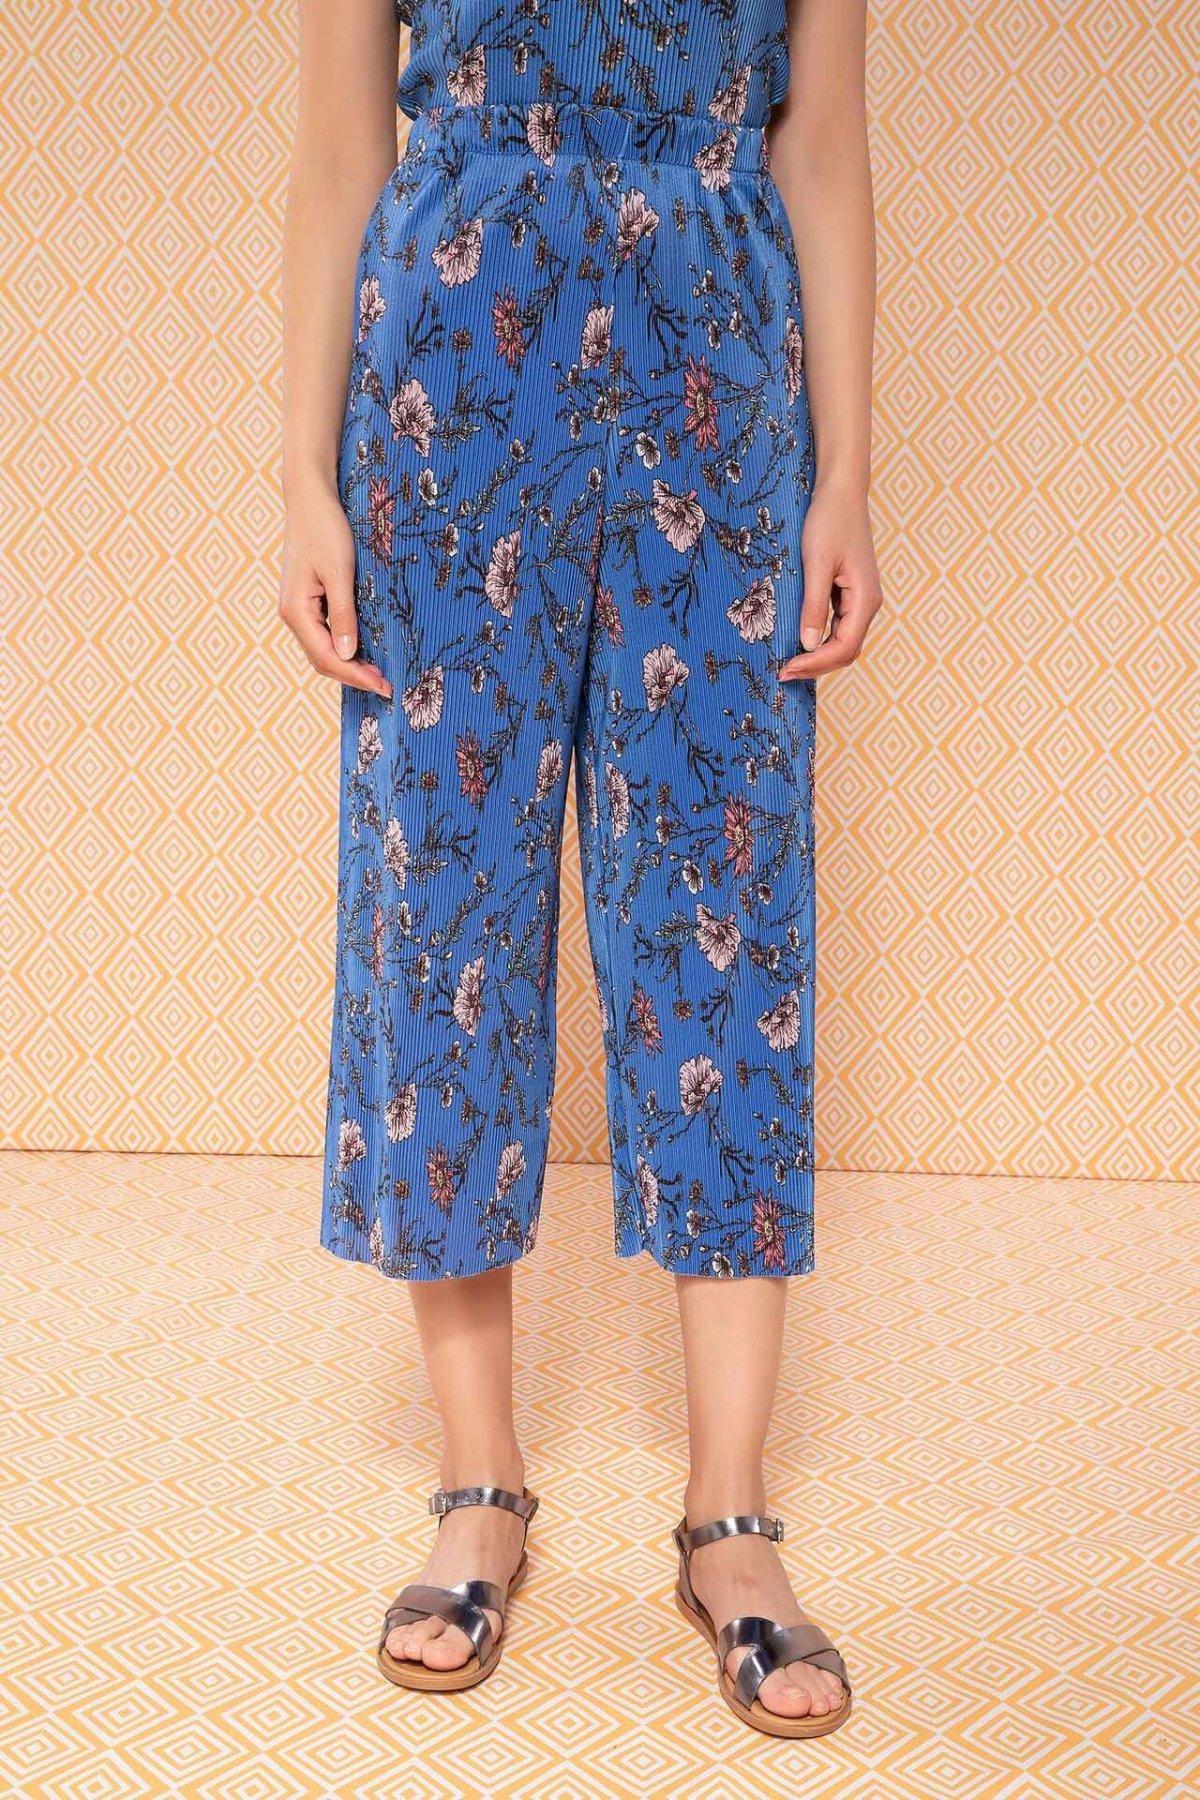 DeFacto Fashion Loose Striped Print Trousers Female Casual Comfort Pants High Qualilty Loose Wide Leg Pant Ladies -J8332AZ18HS